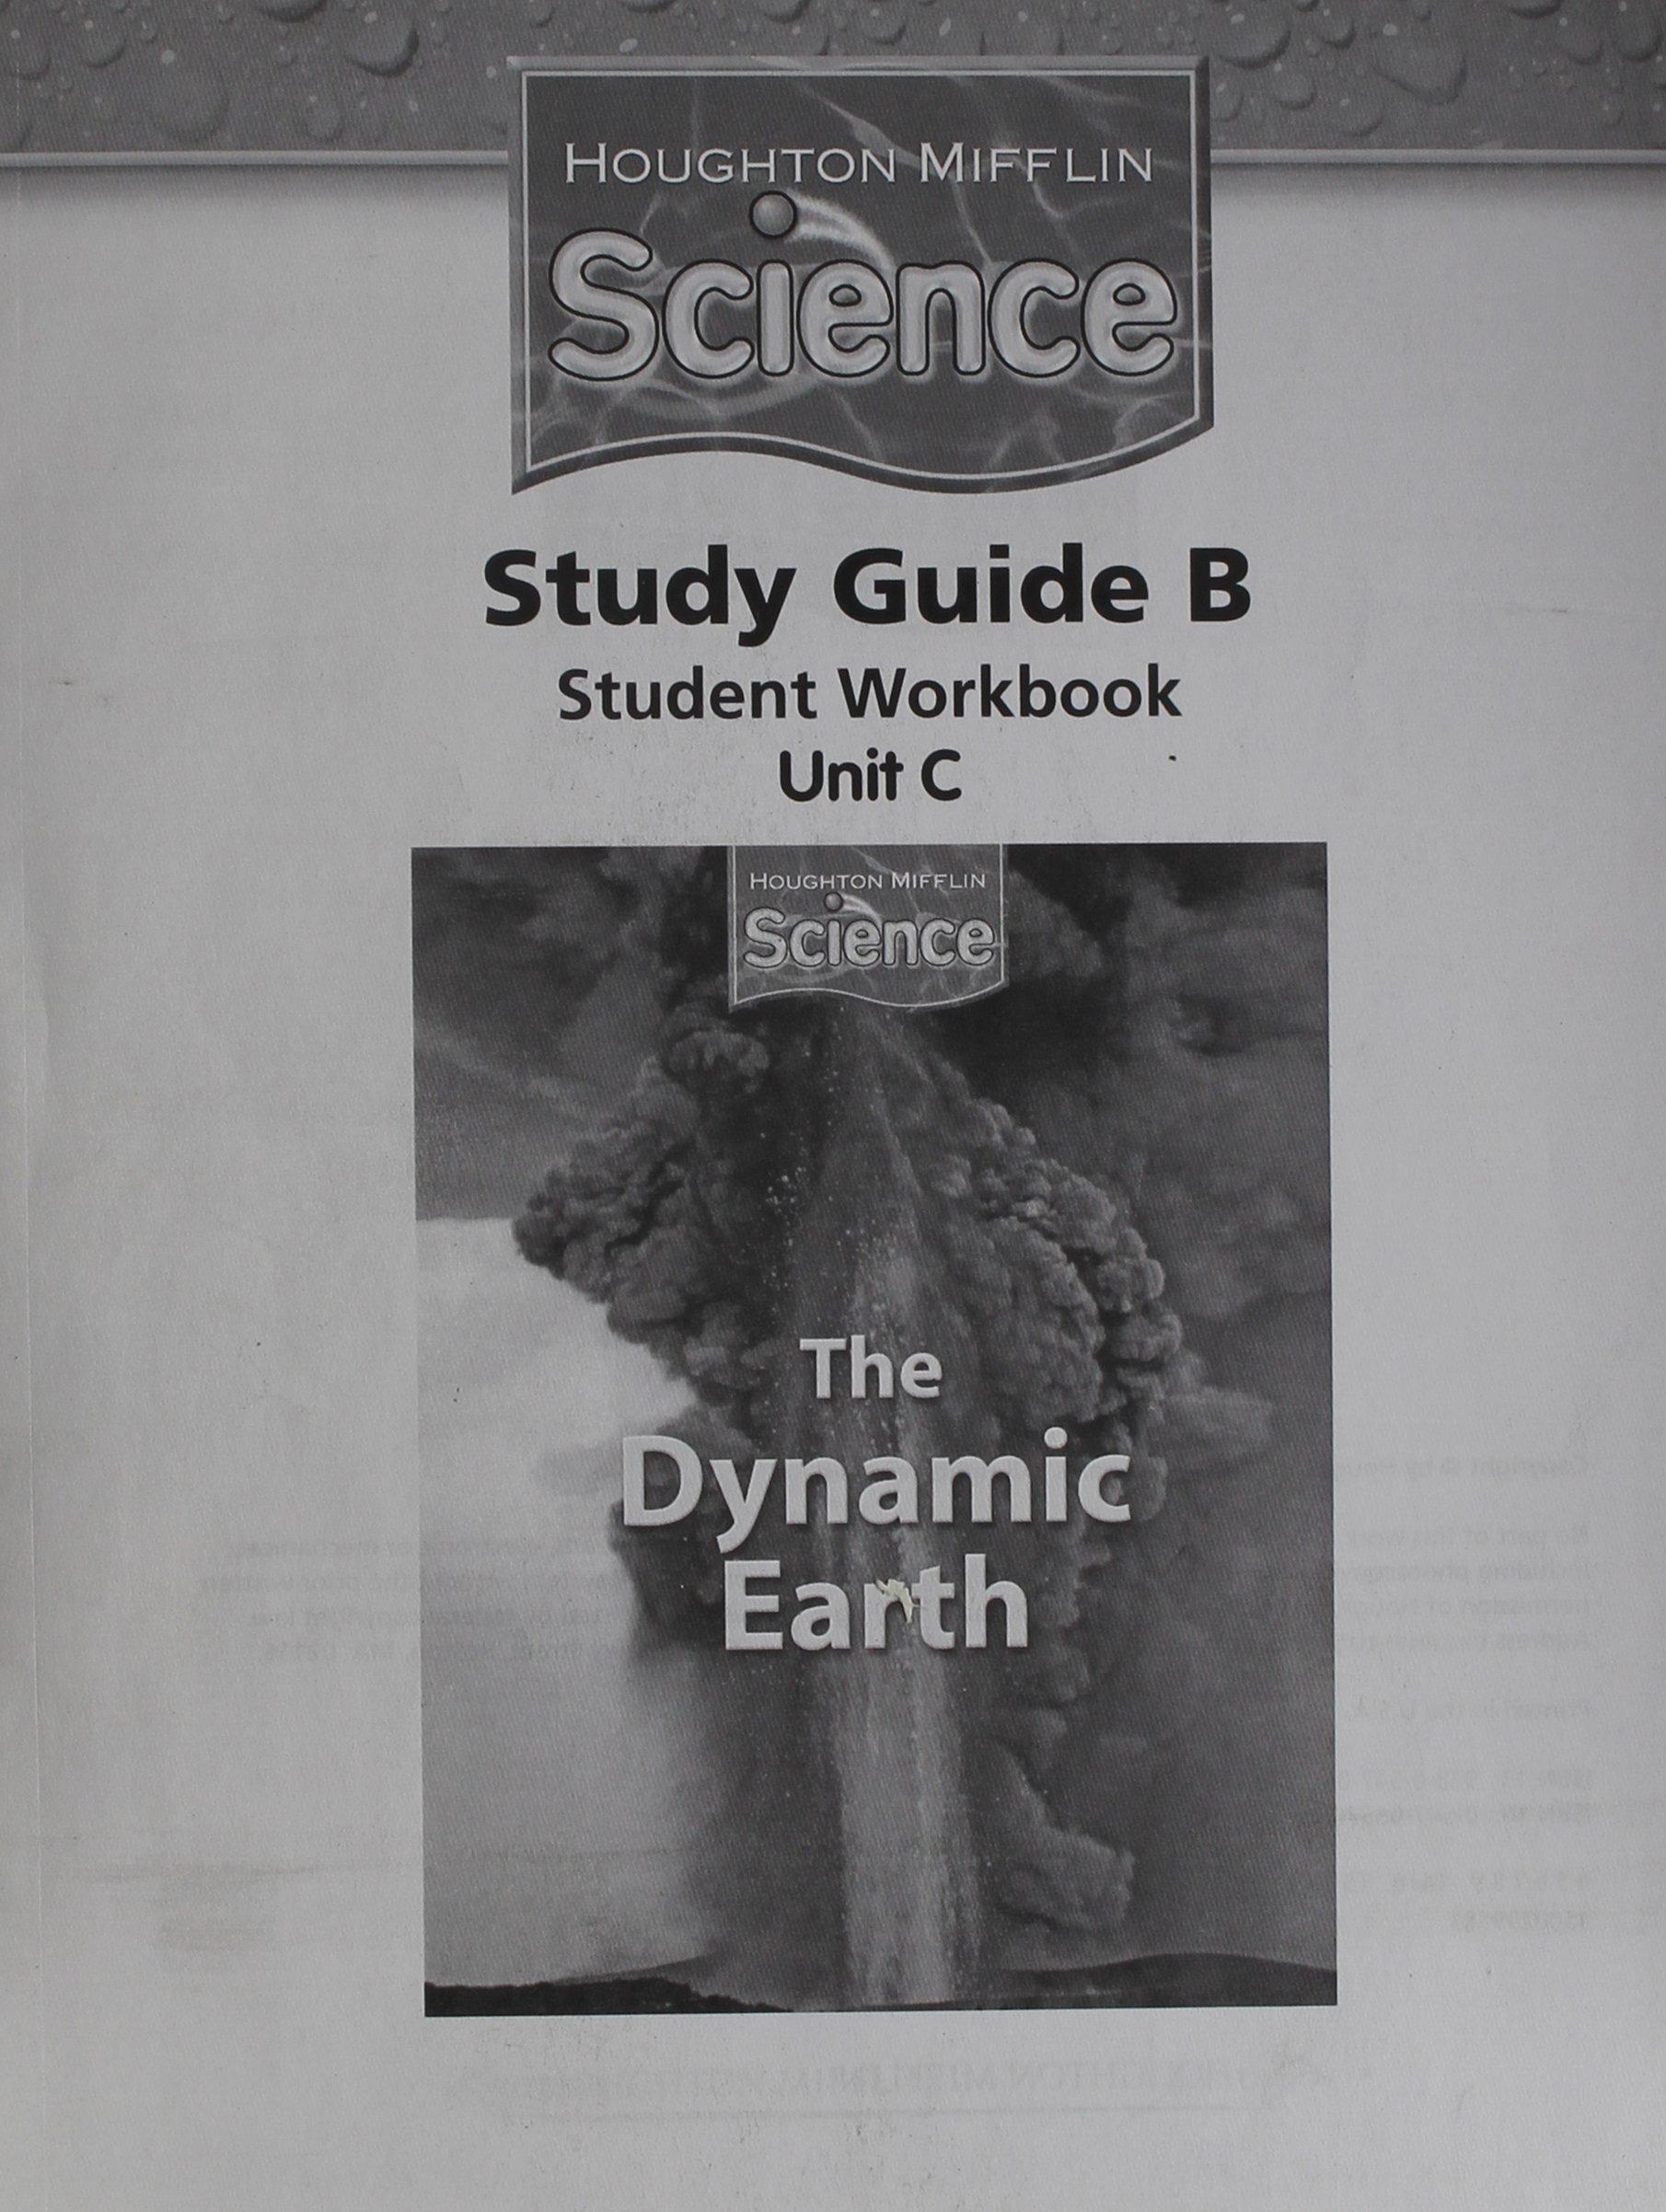 Houghton Mifflin Science: Study Guide Booklet Grade 6 Module